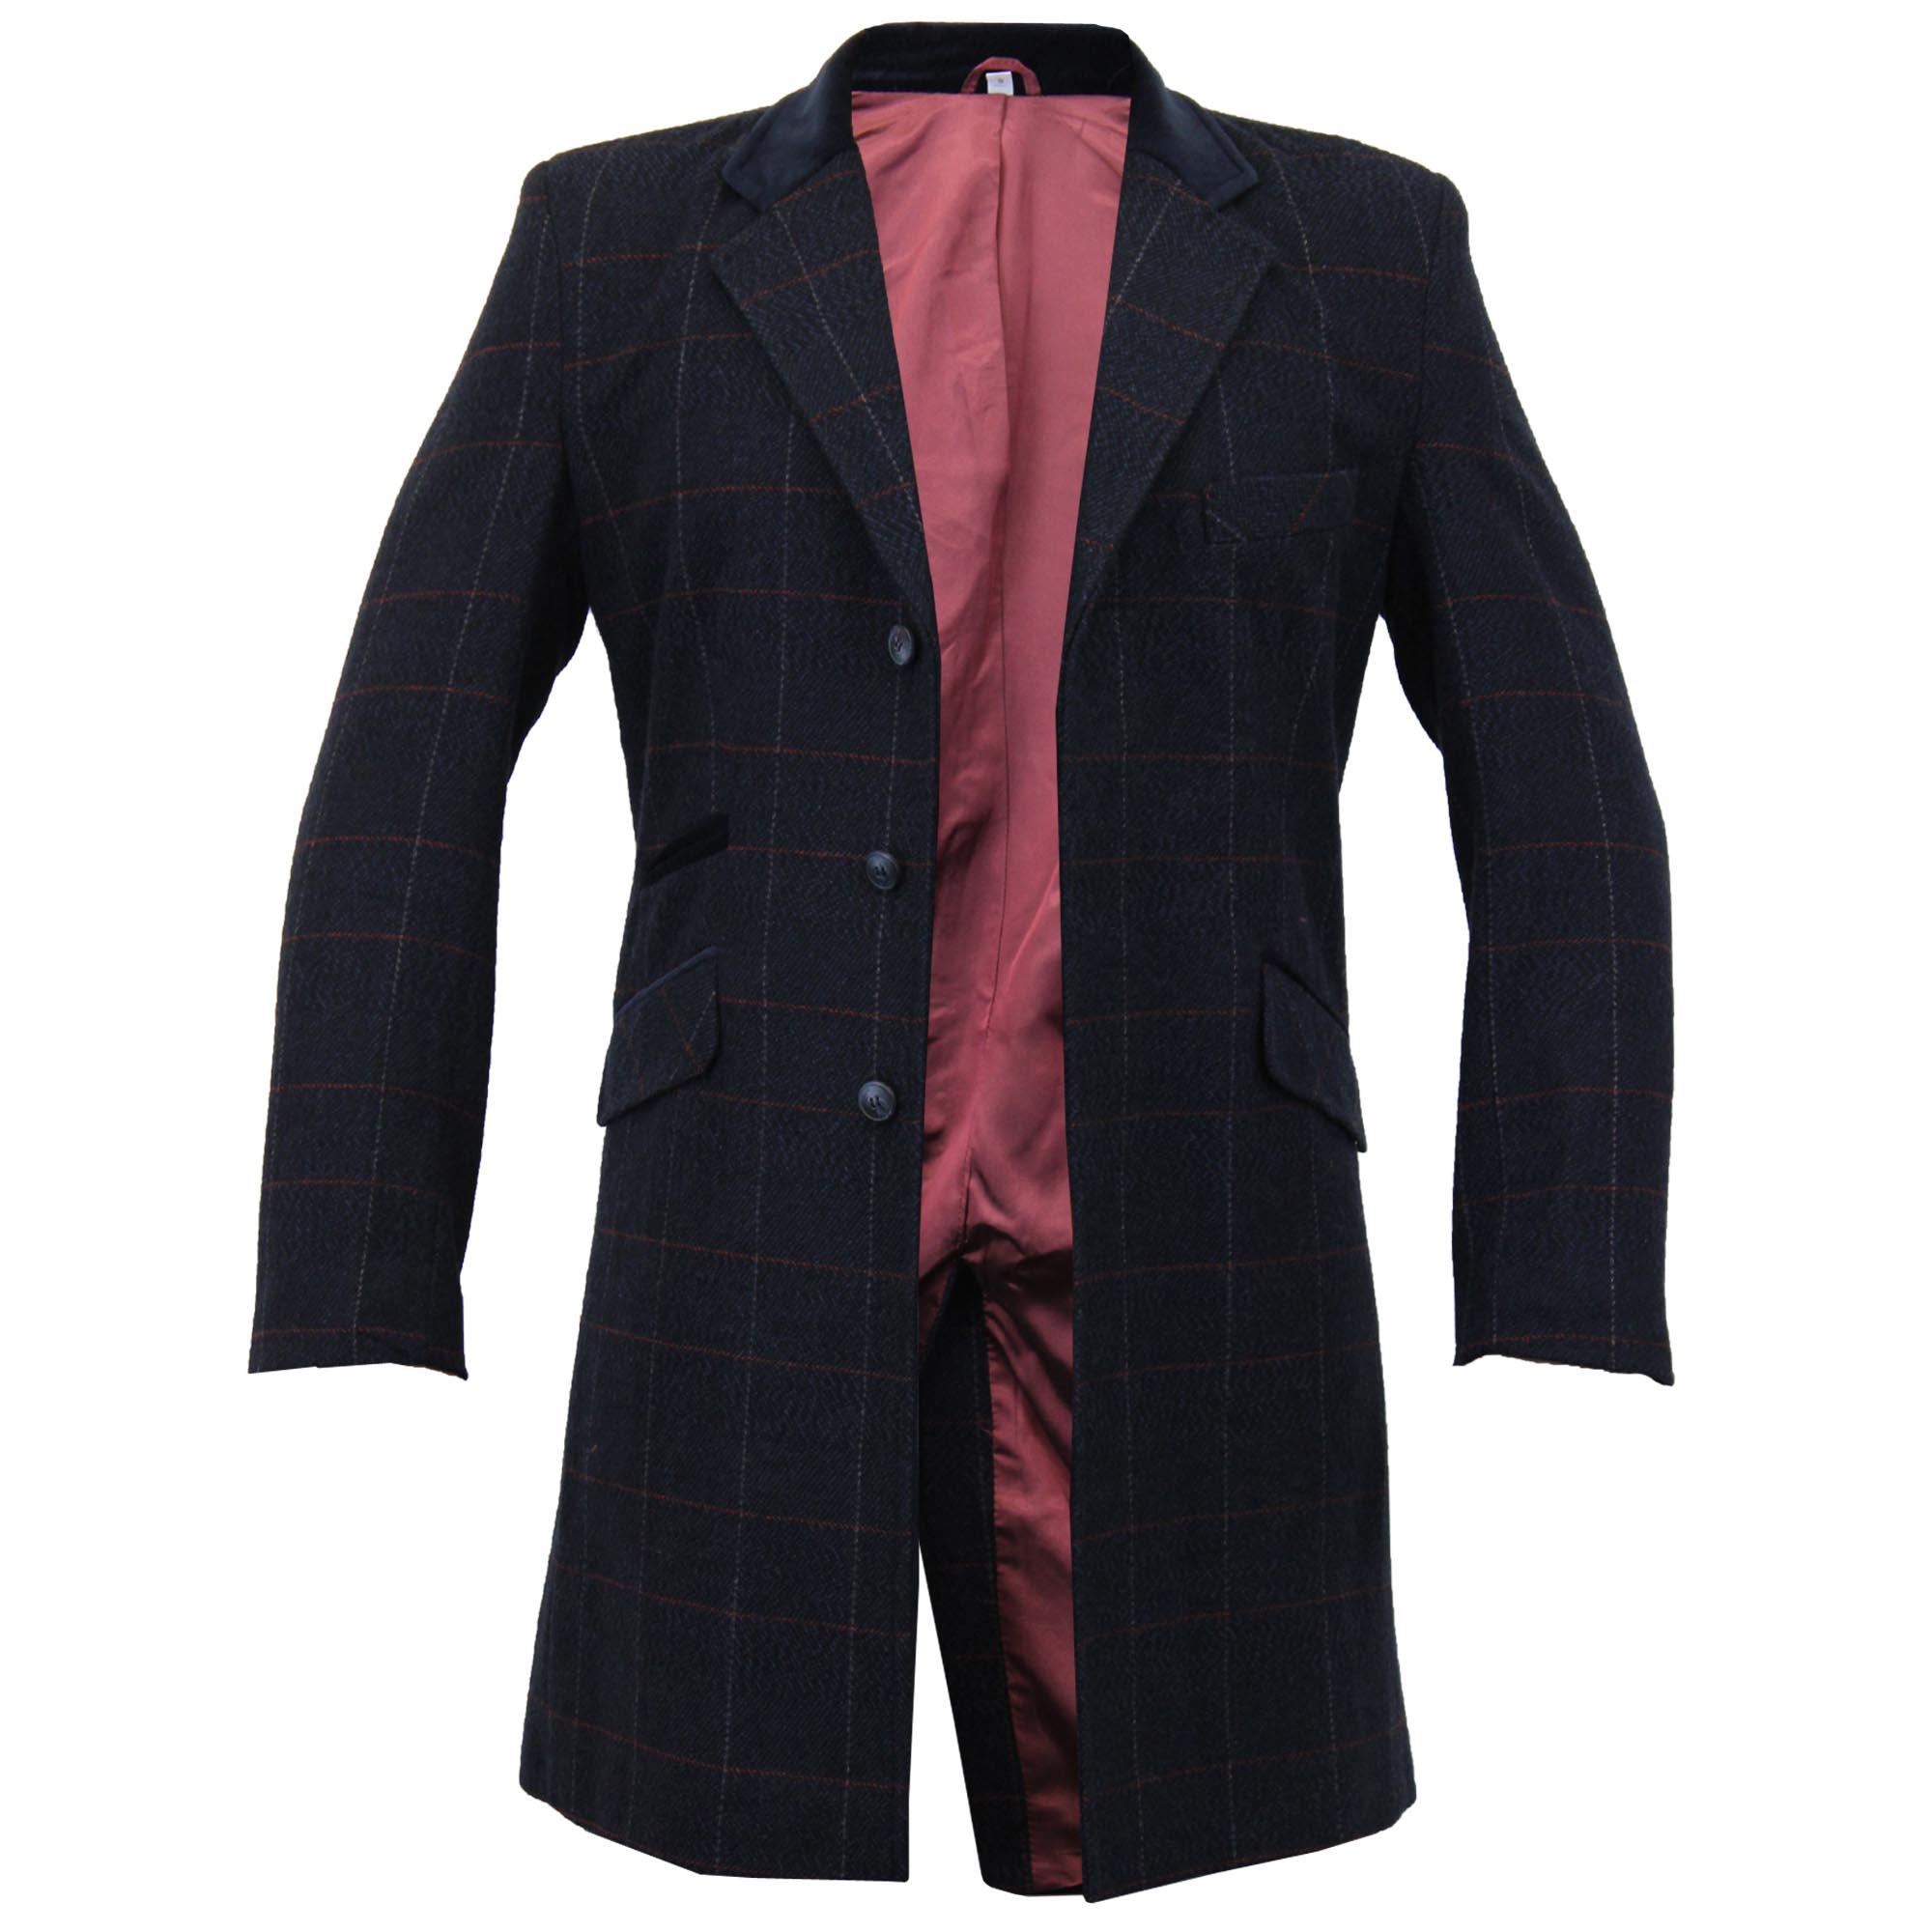 Mens-Wool-Mix-Trench-Coat-Checked-Jacket-Herringbone-Tweed-Overcoat-Lined-Winter thumbnail 12